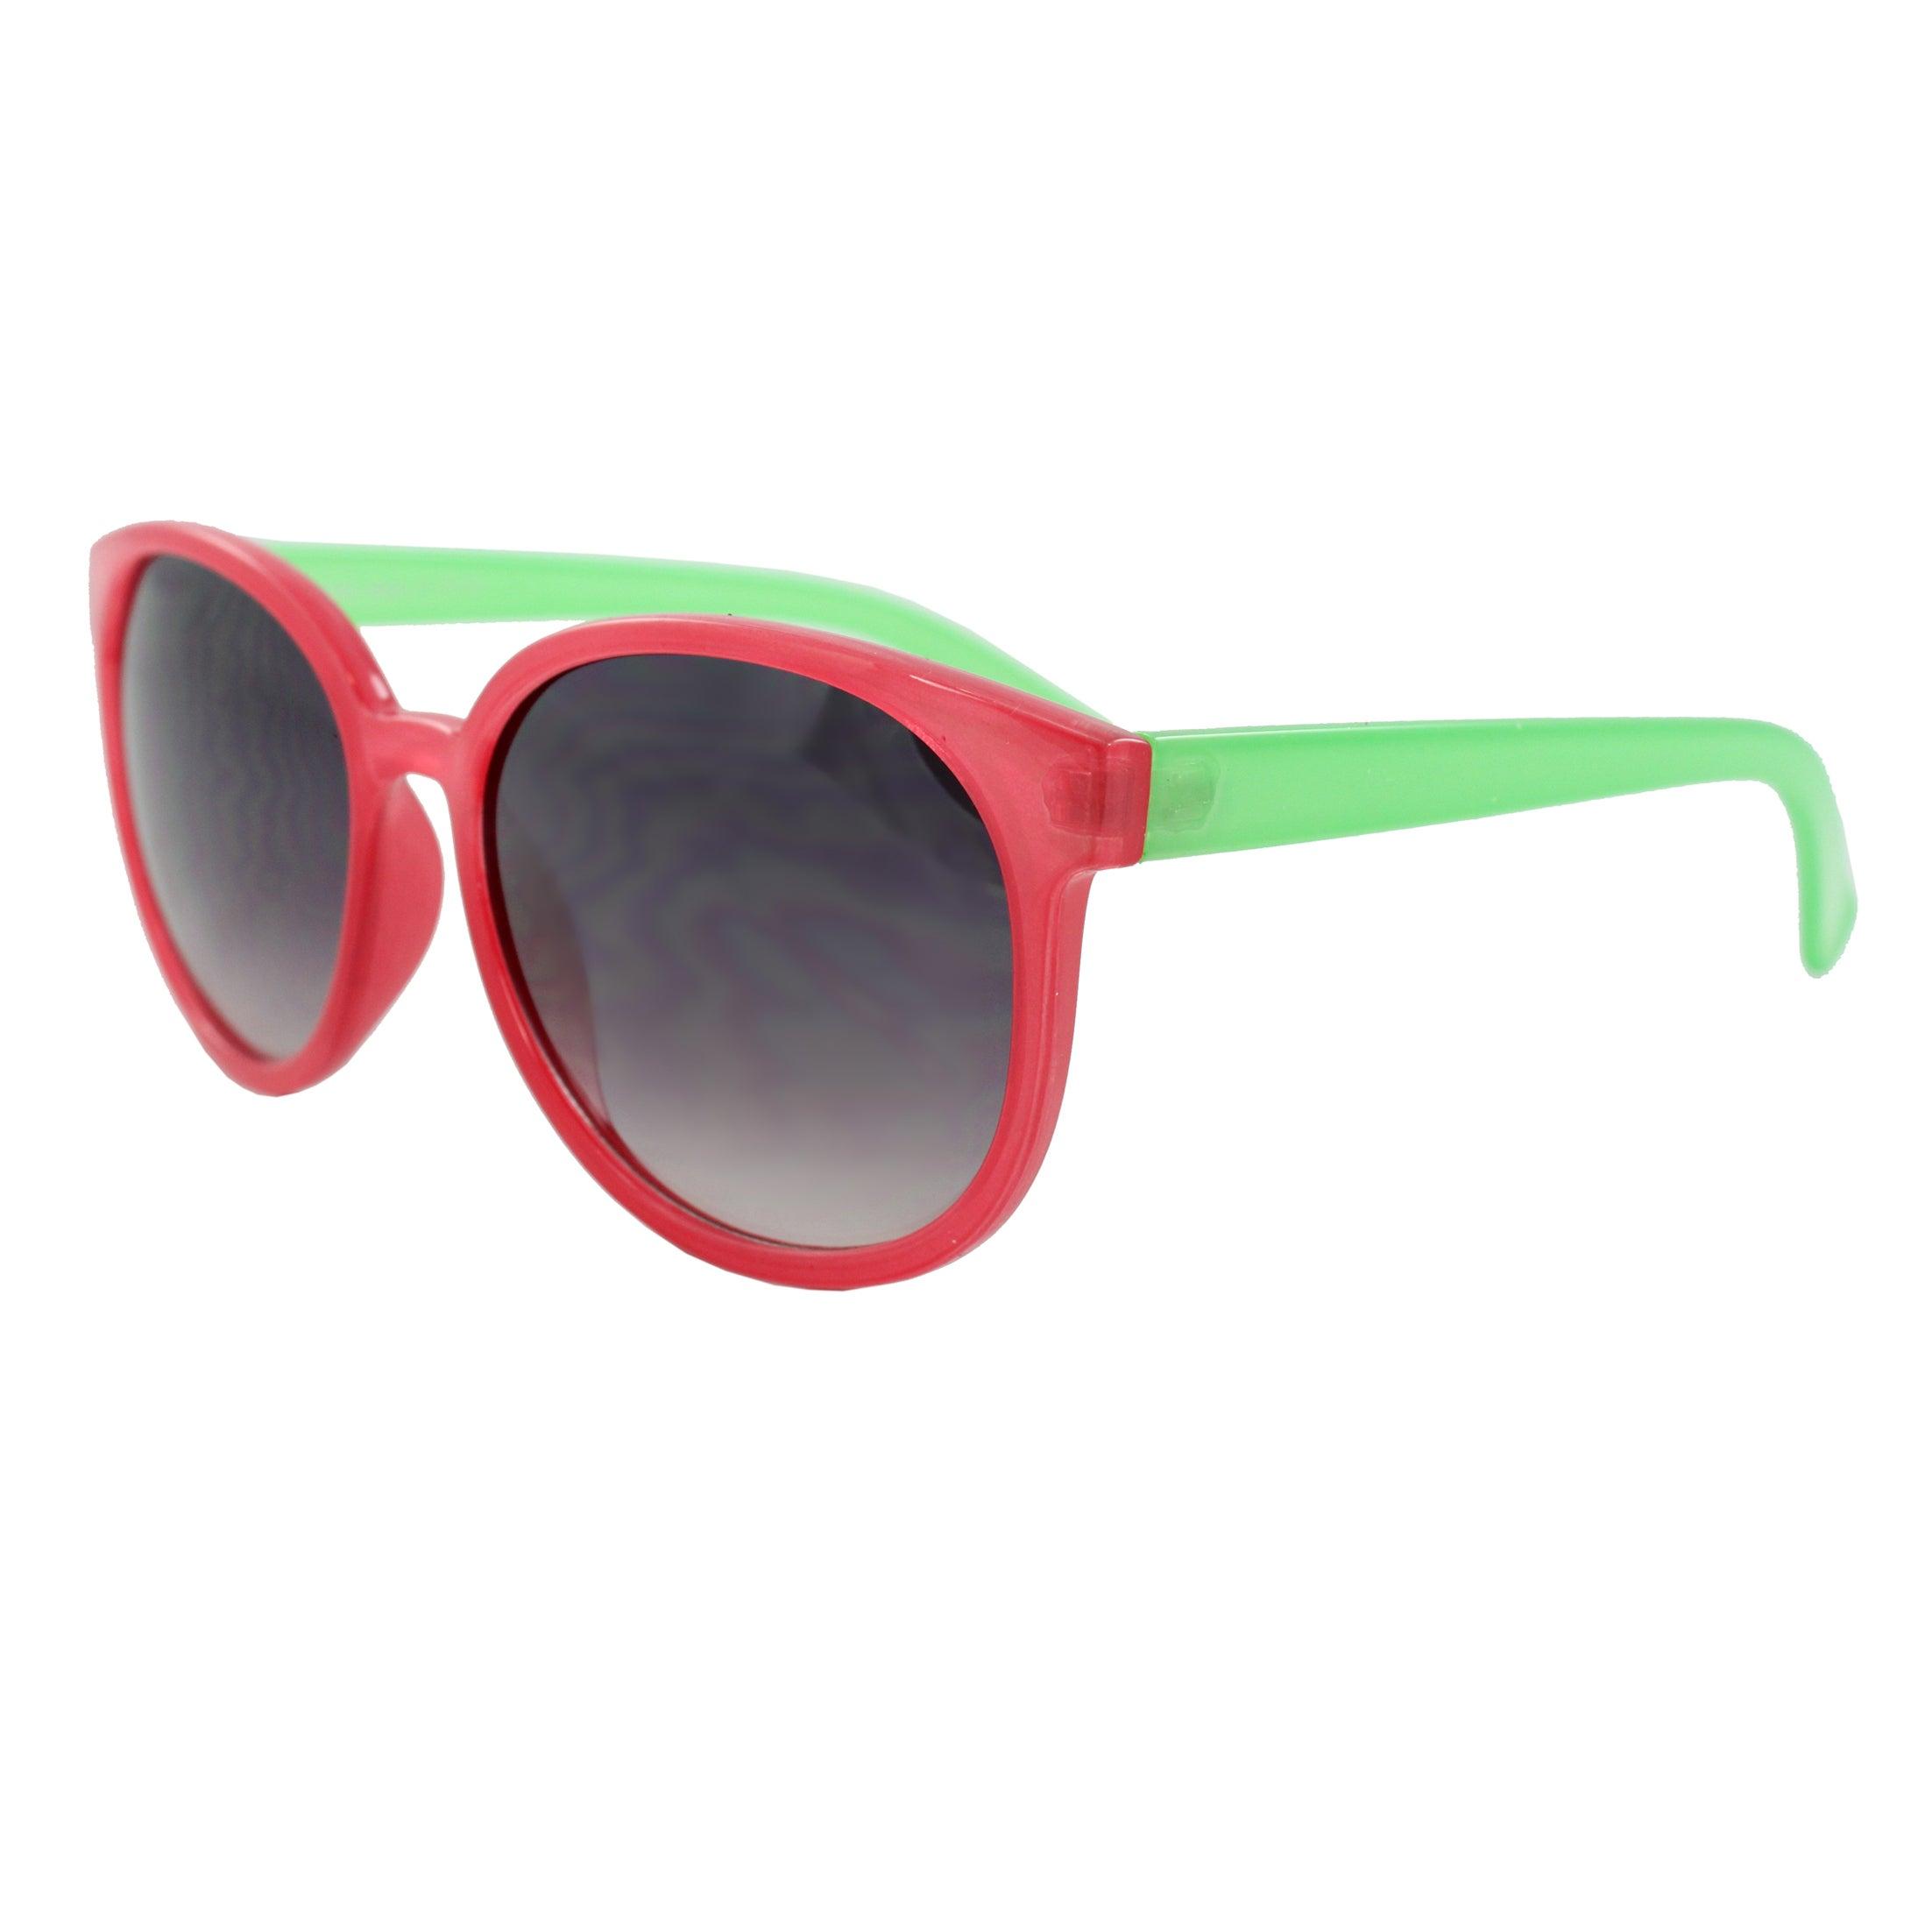 Women's Pink/ Green Oval Fashion Sunglasses